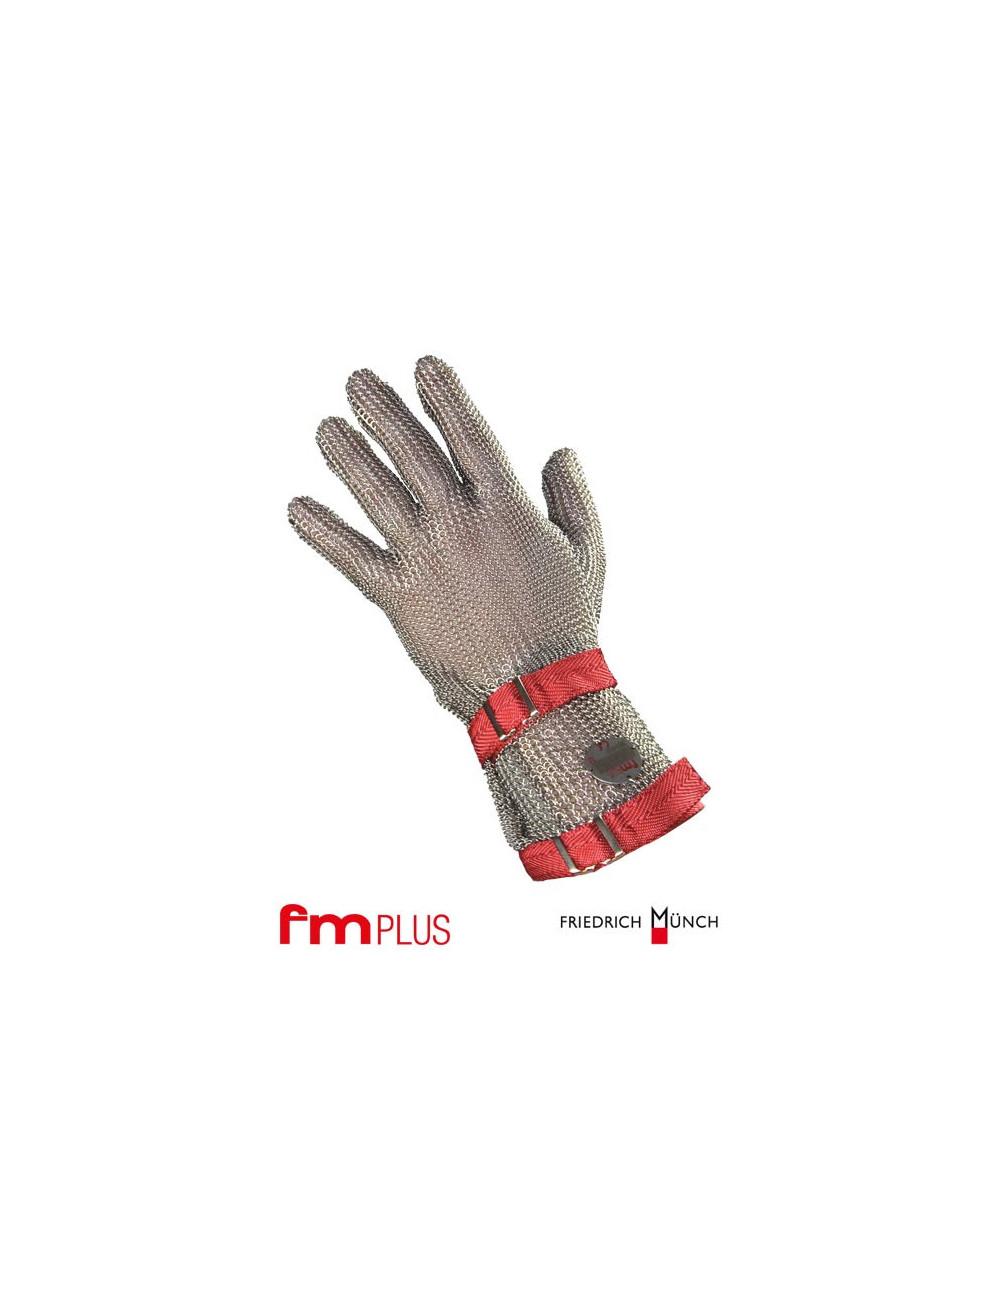 FRIEDRICH MÜNCH RĘKAWICE OCHRONNE RNIR-FMPLUS-7-5